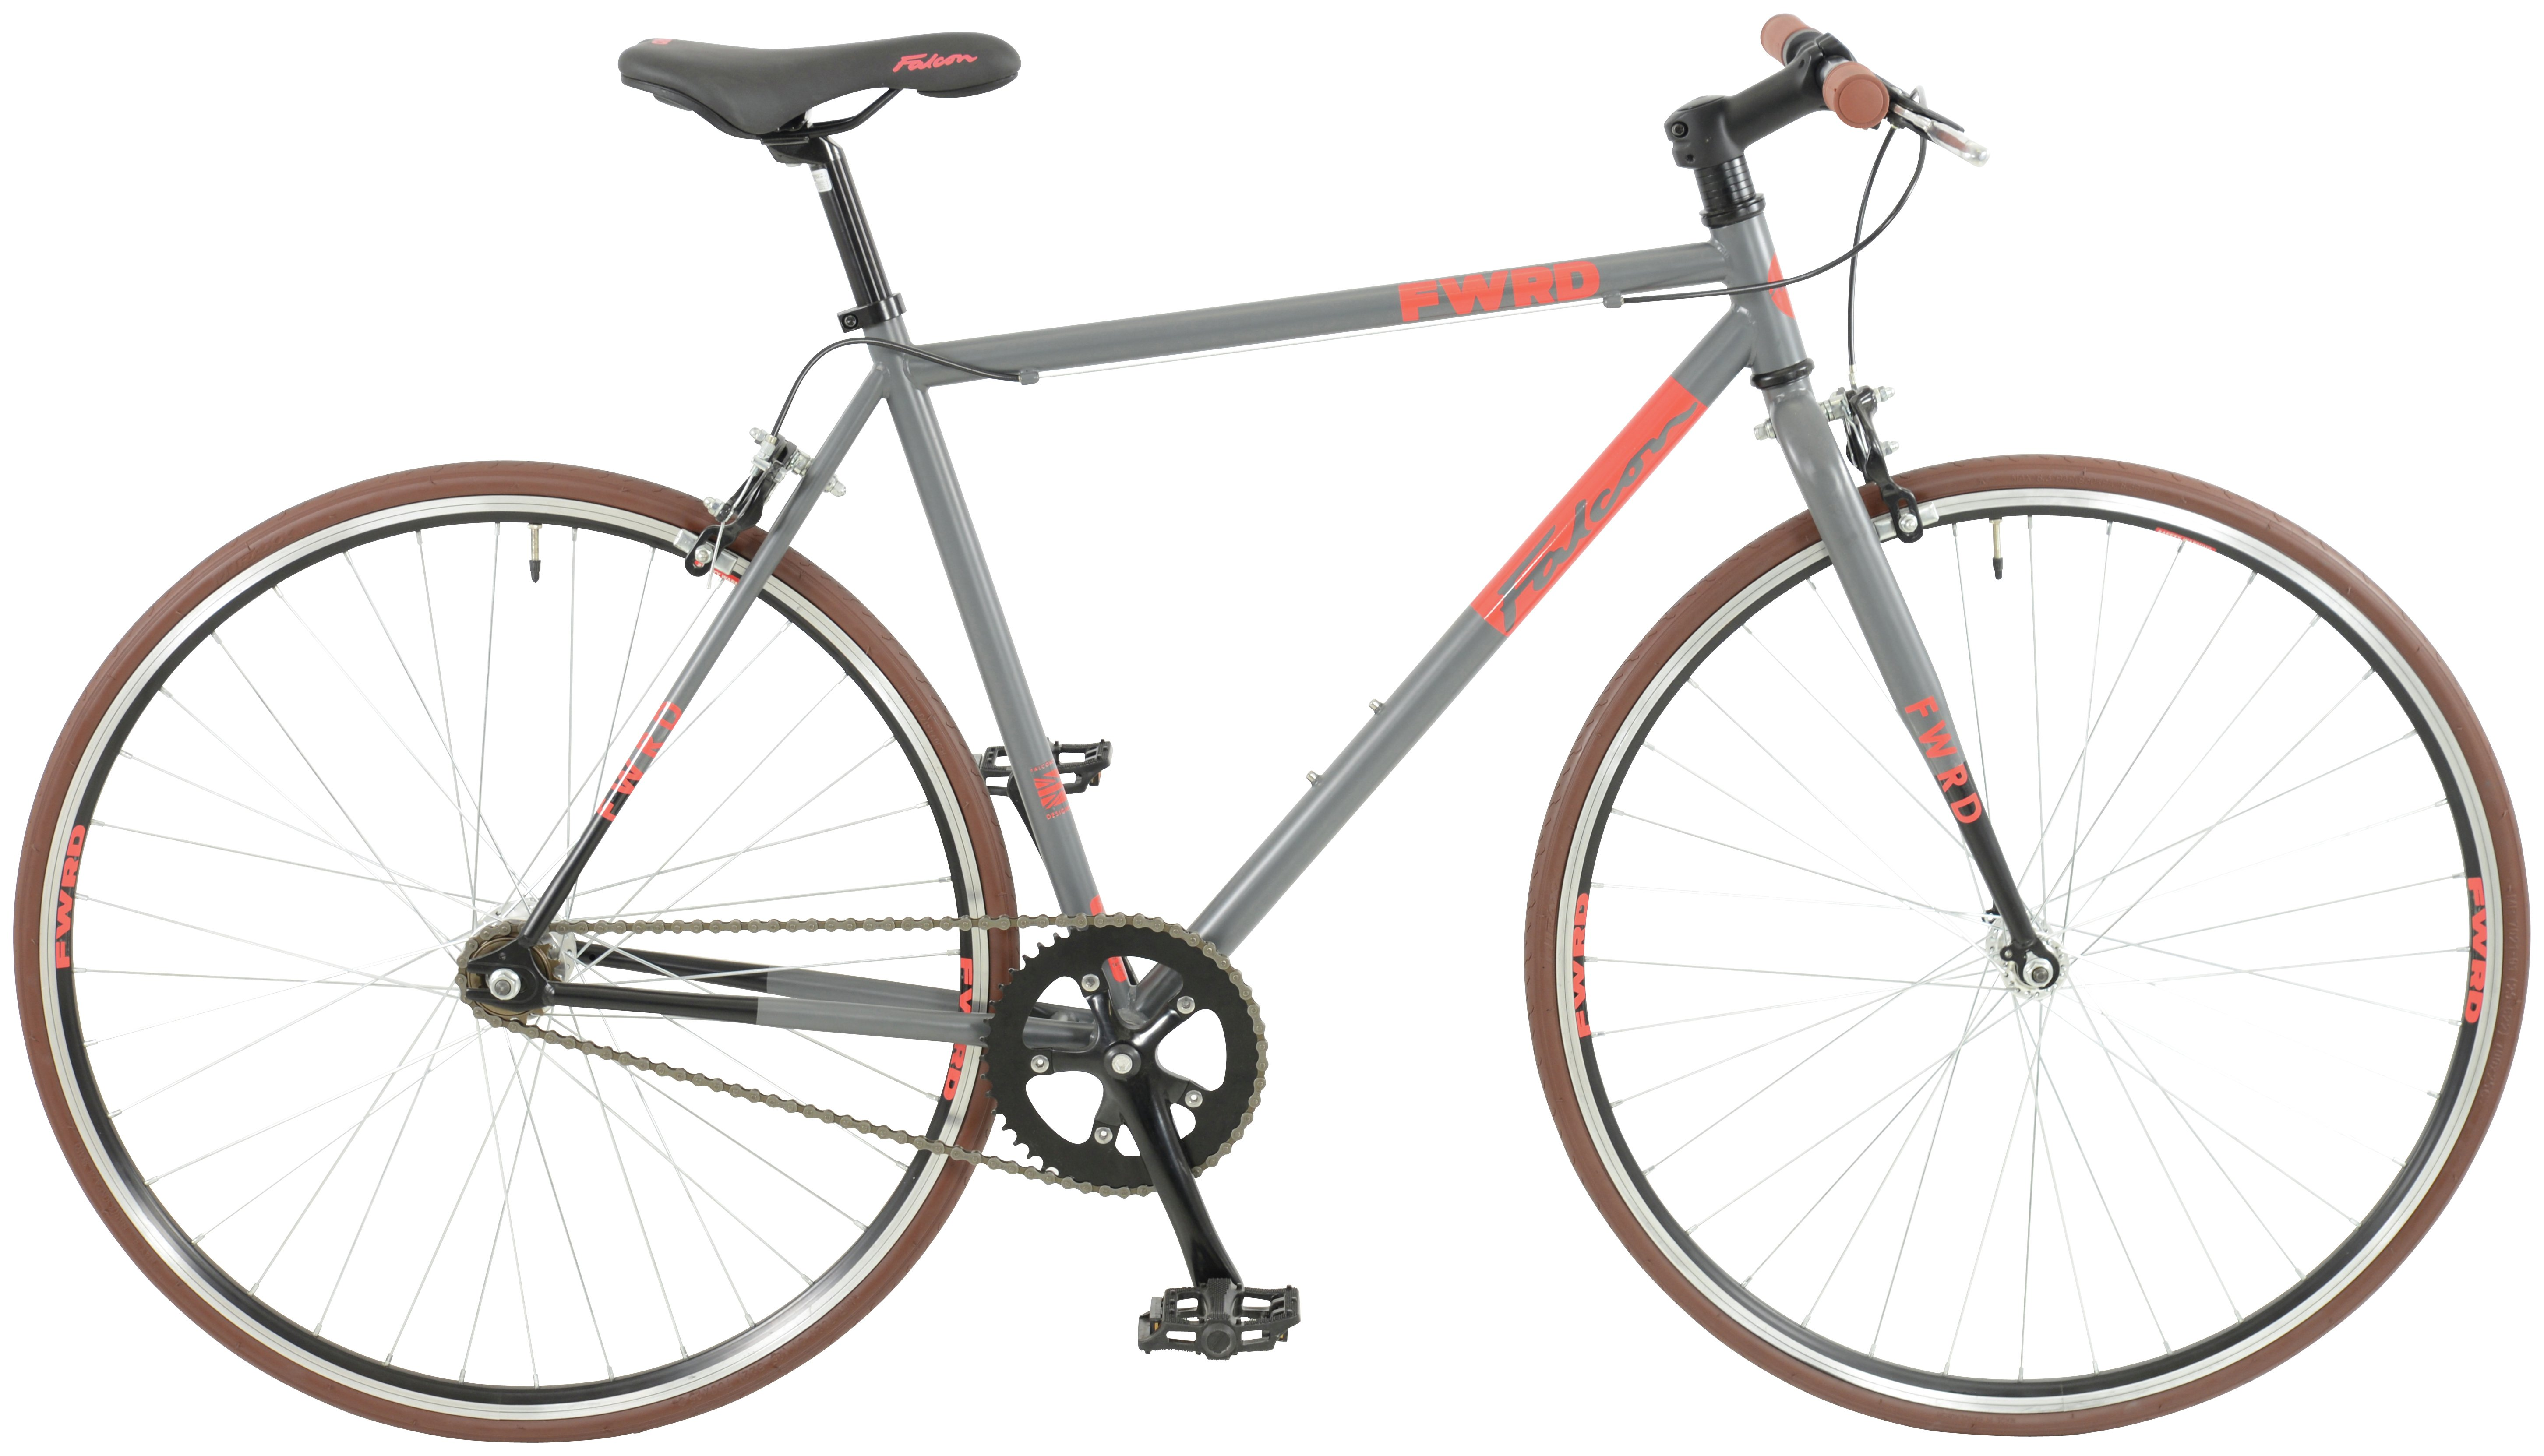 Image of Falcon Forward Fixie Bike